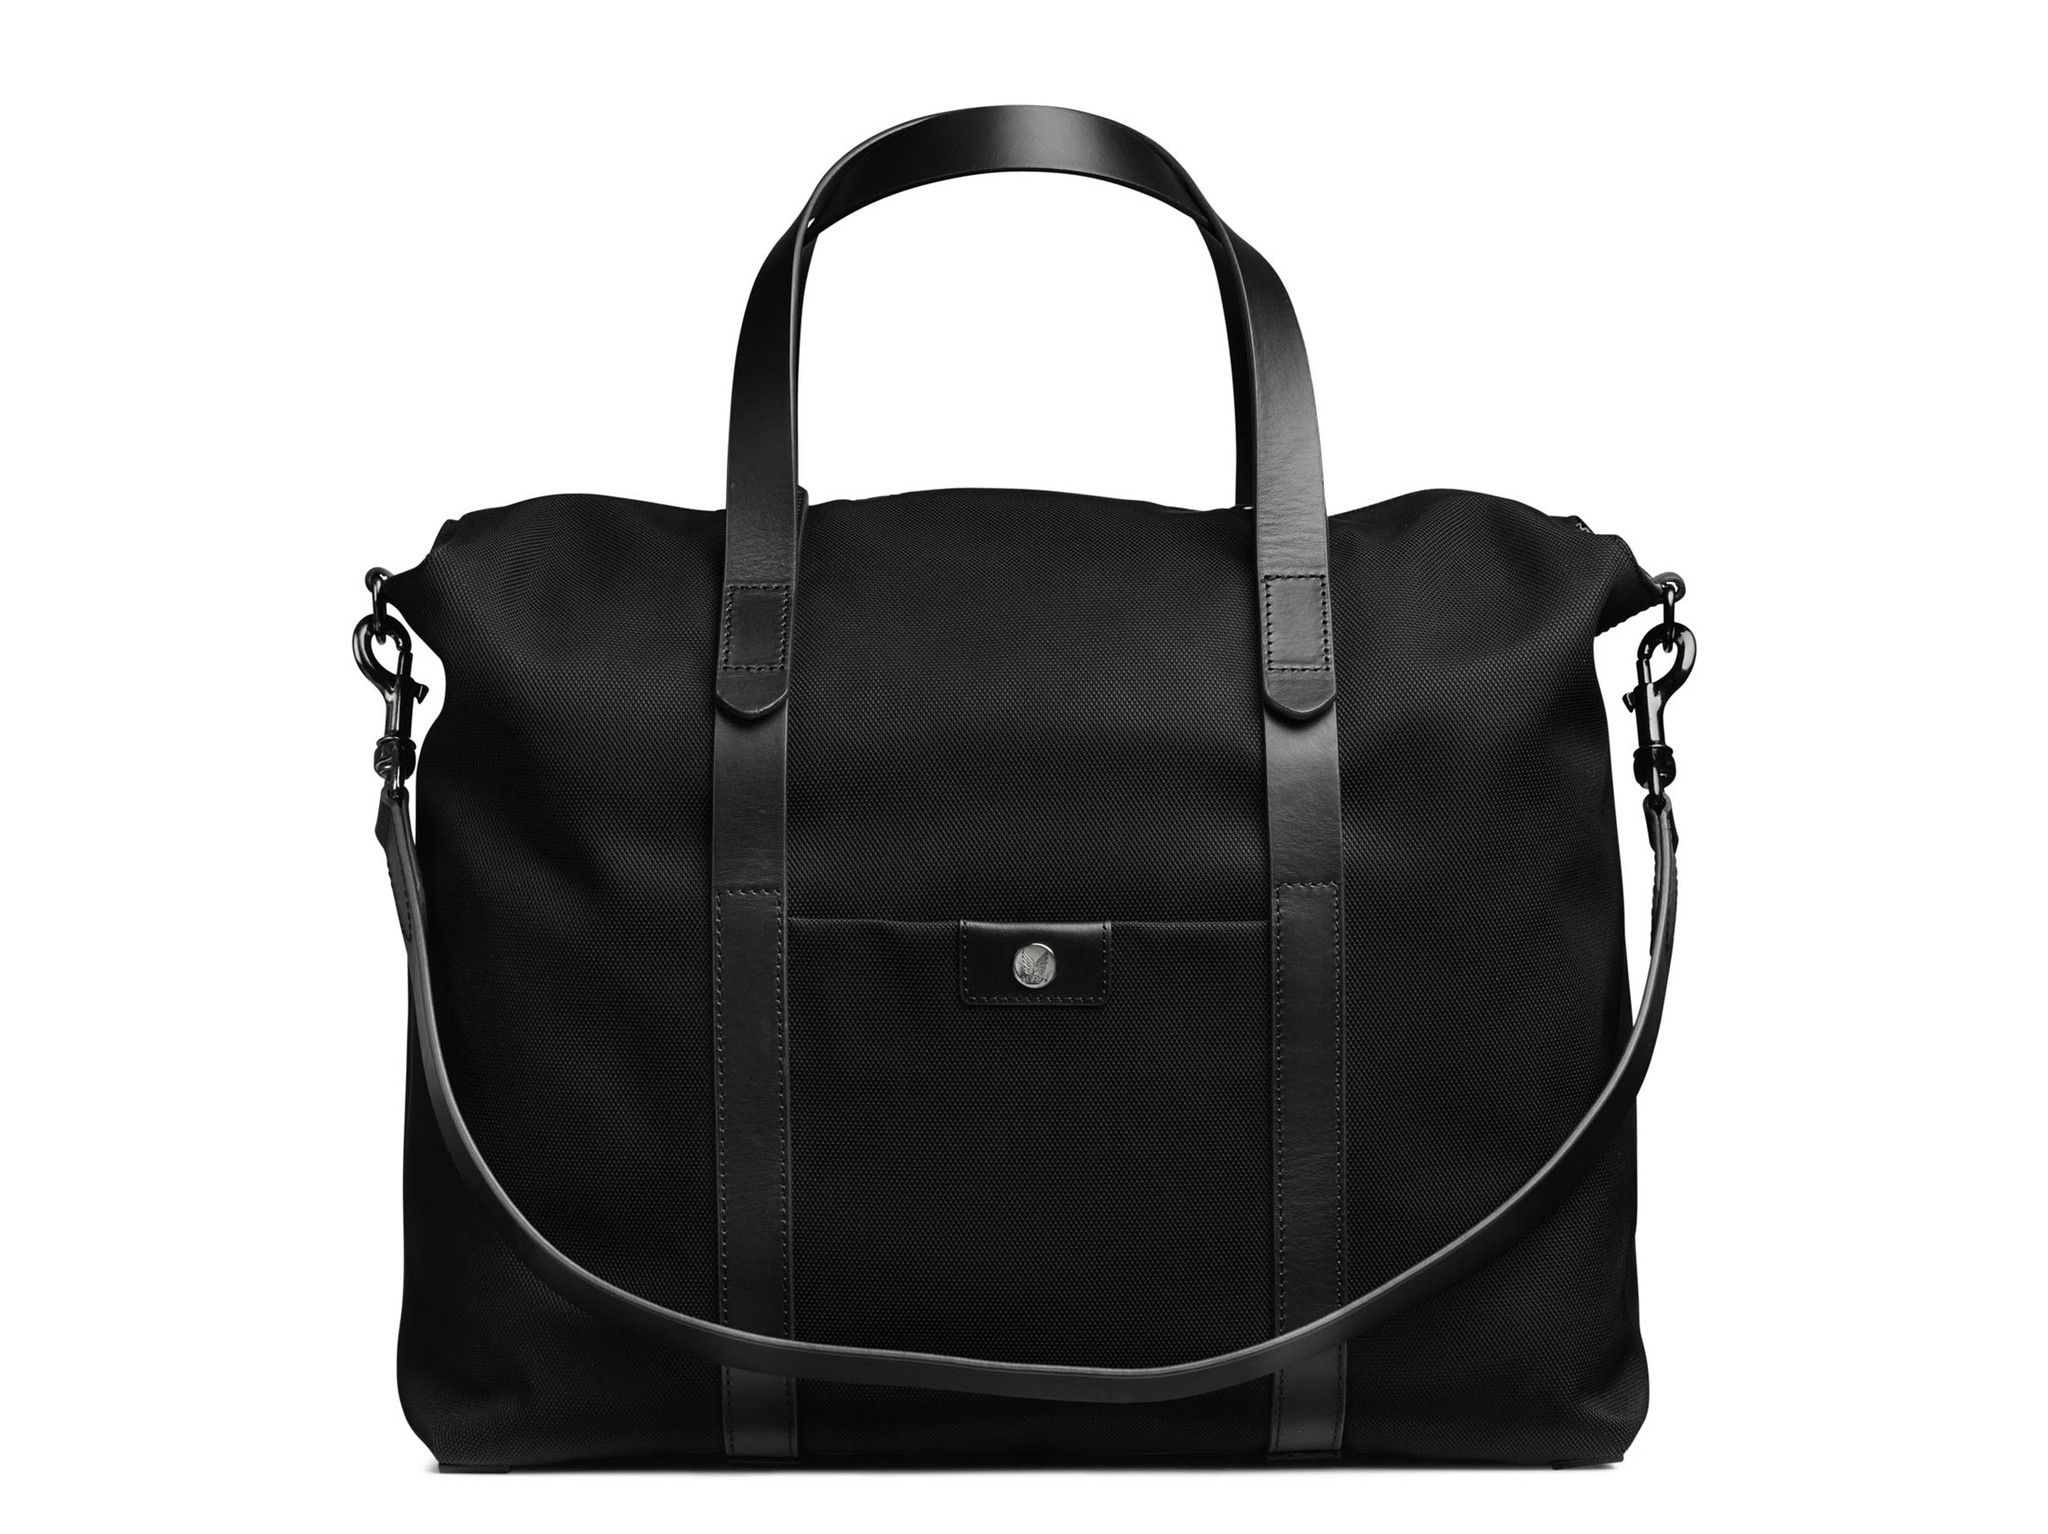 M/S Beach Tote - Black/Black - Tote bag - Mismo - 1 | MISMO Bags ...